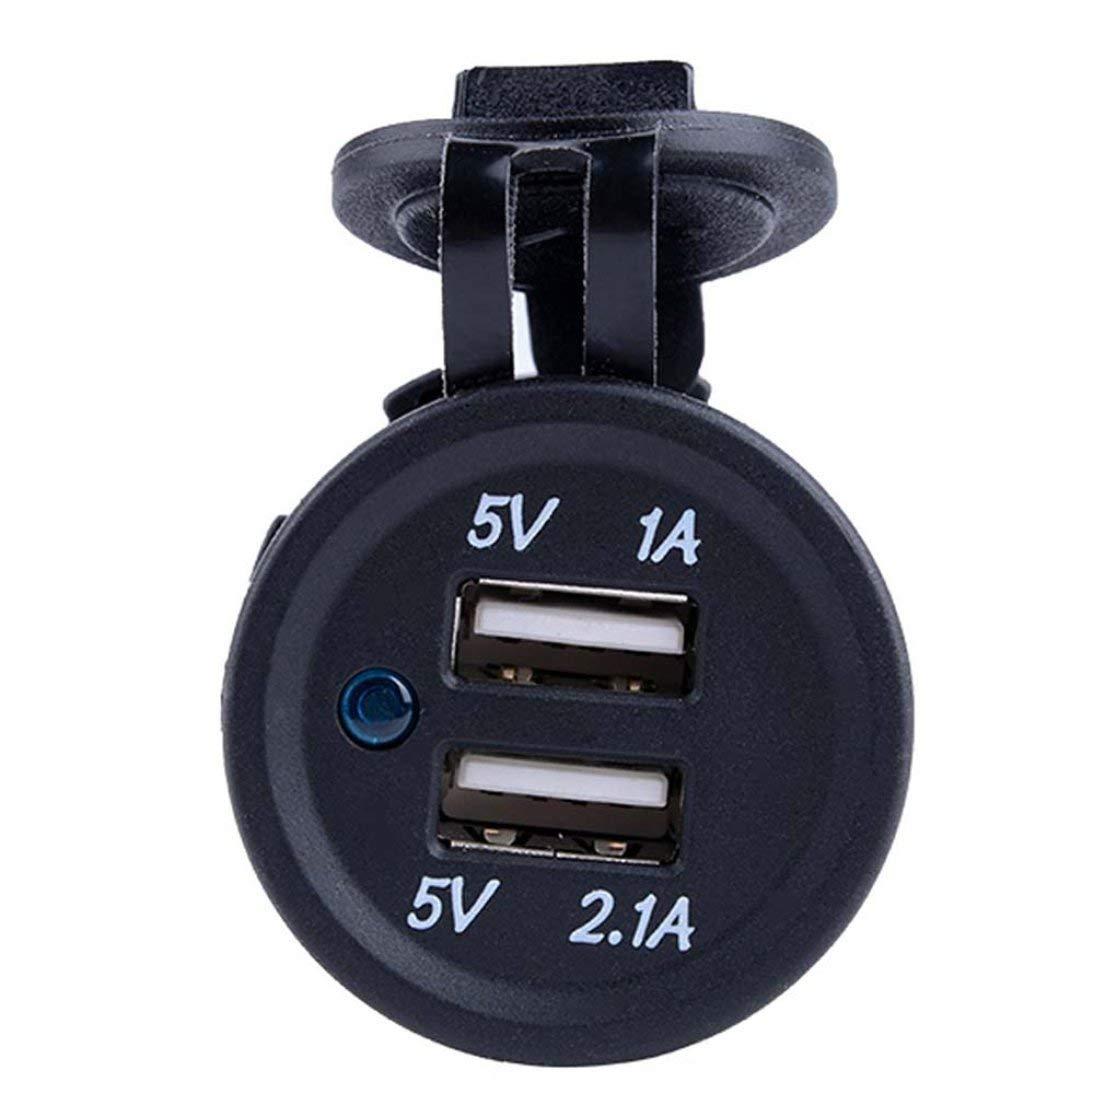 Color: Negro DF-ES Negro Impermeable Pr/áctico Duradero 12-24V Dual 2 USB Cigarrillos para autom/óvil Encendedor Enchufe Divisor Cargador Adaptador de Corriente Salida